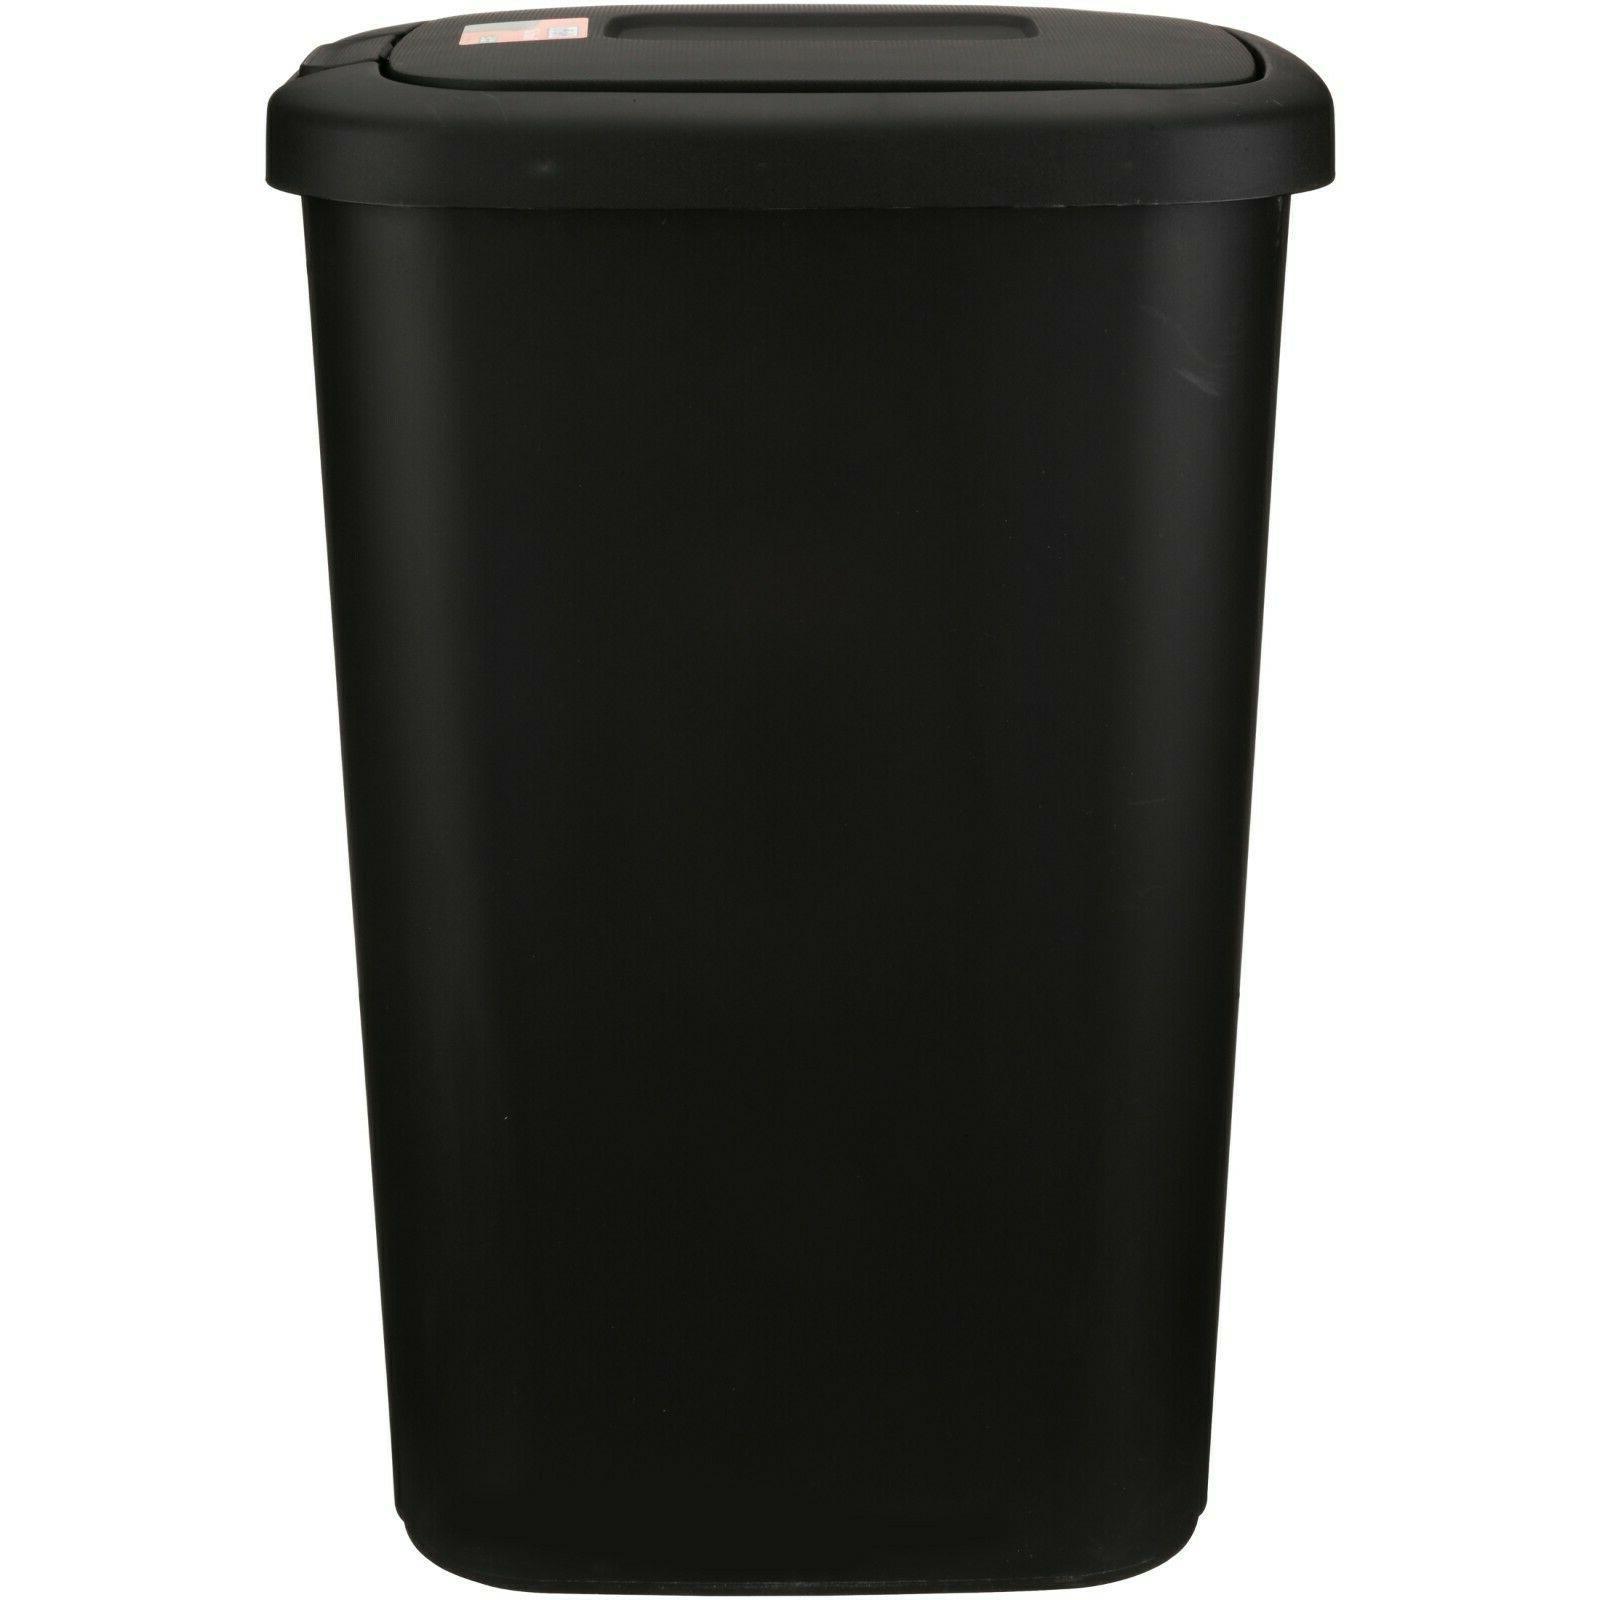 13 Gallon with Trash